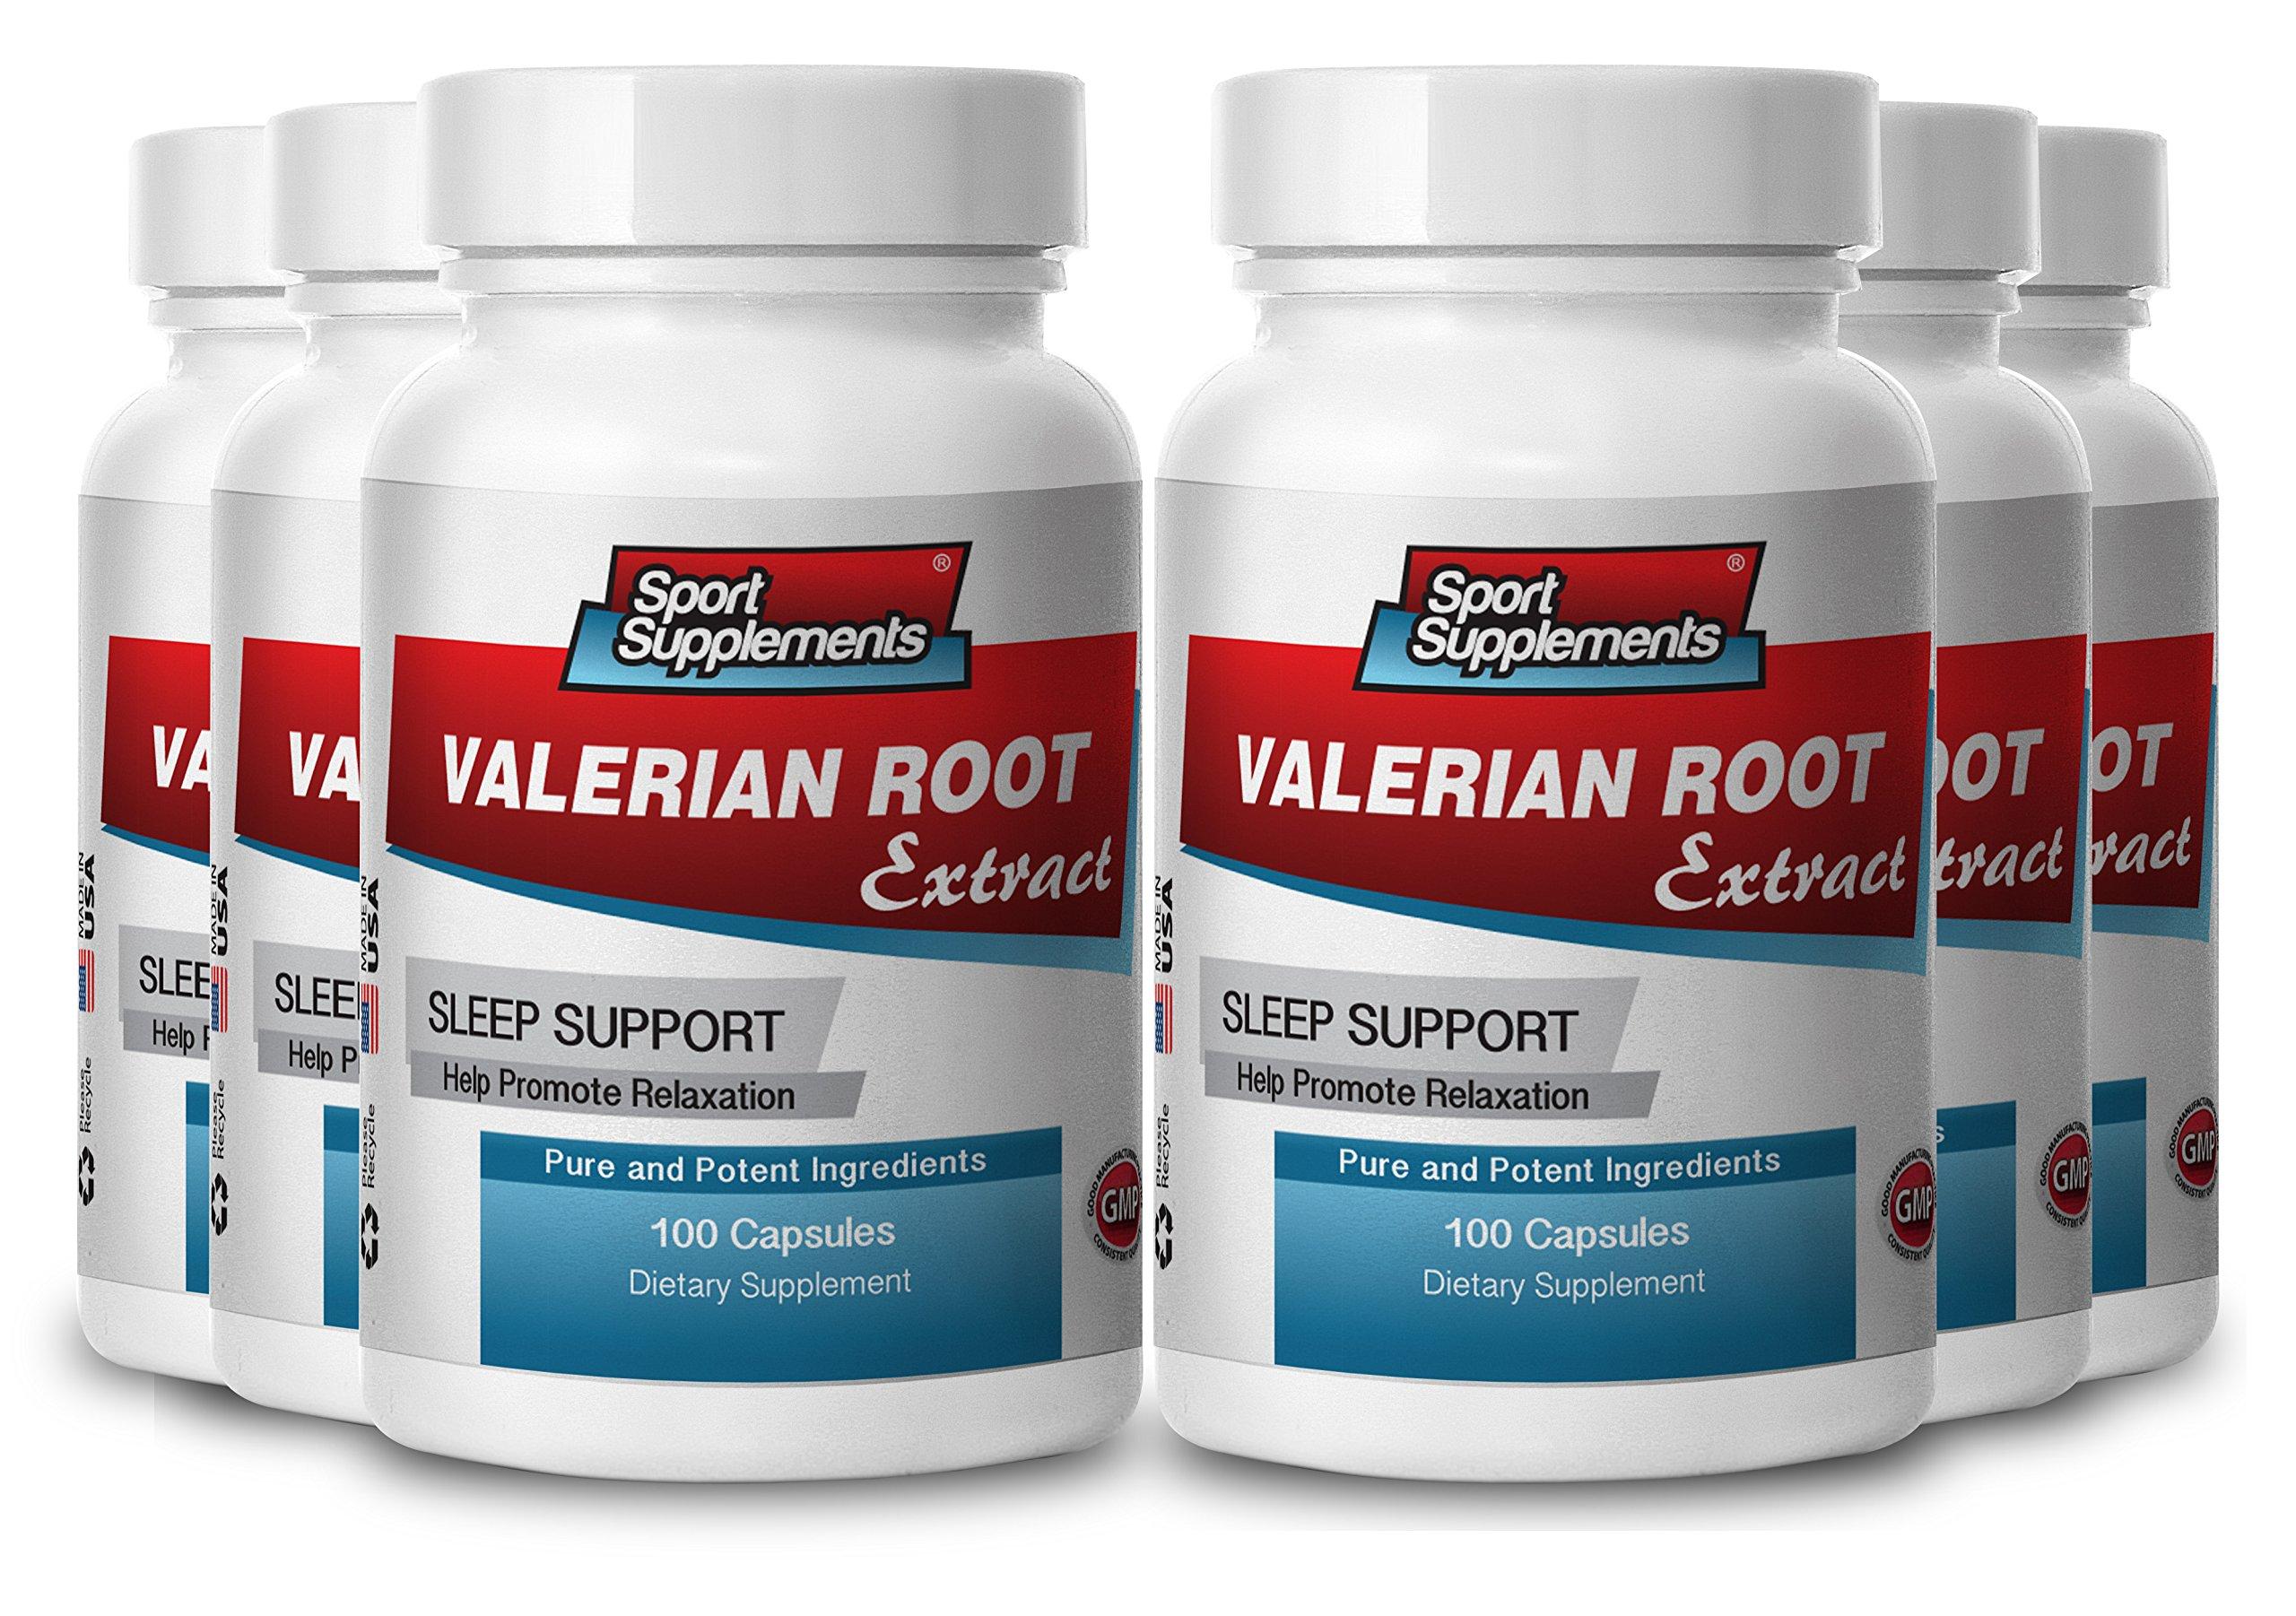 valerian root sleep aid - Valerian Root Extract 4:1 125mg - Enchance Mood and Improve Sleep with Herbal Valerian Root Extract (6 bottles 600 capsules)